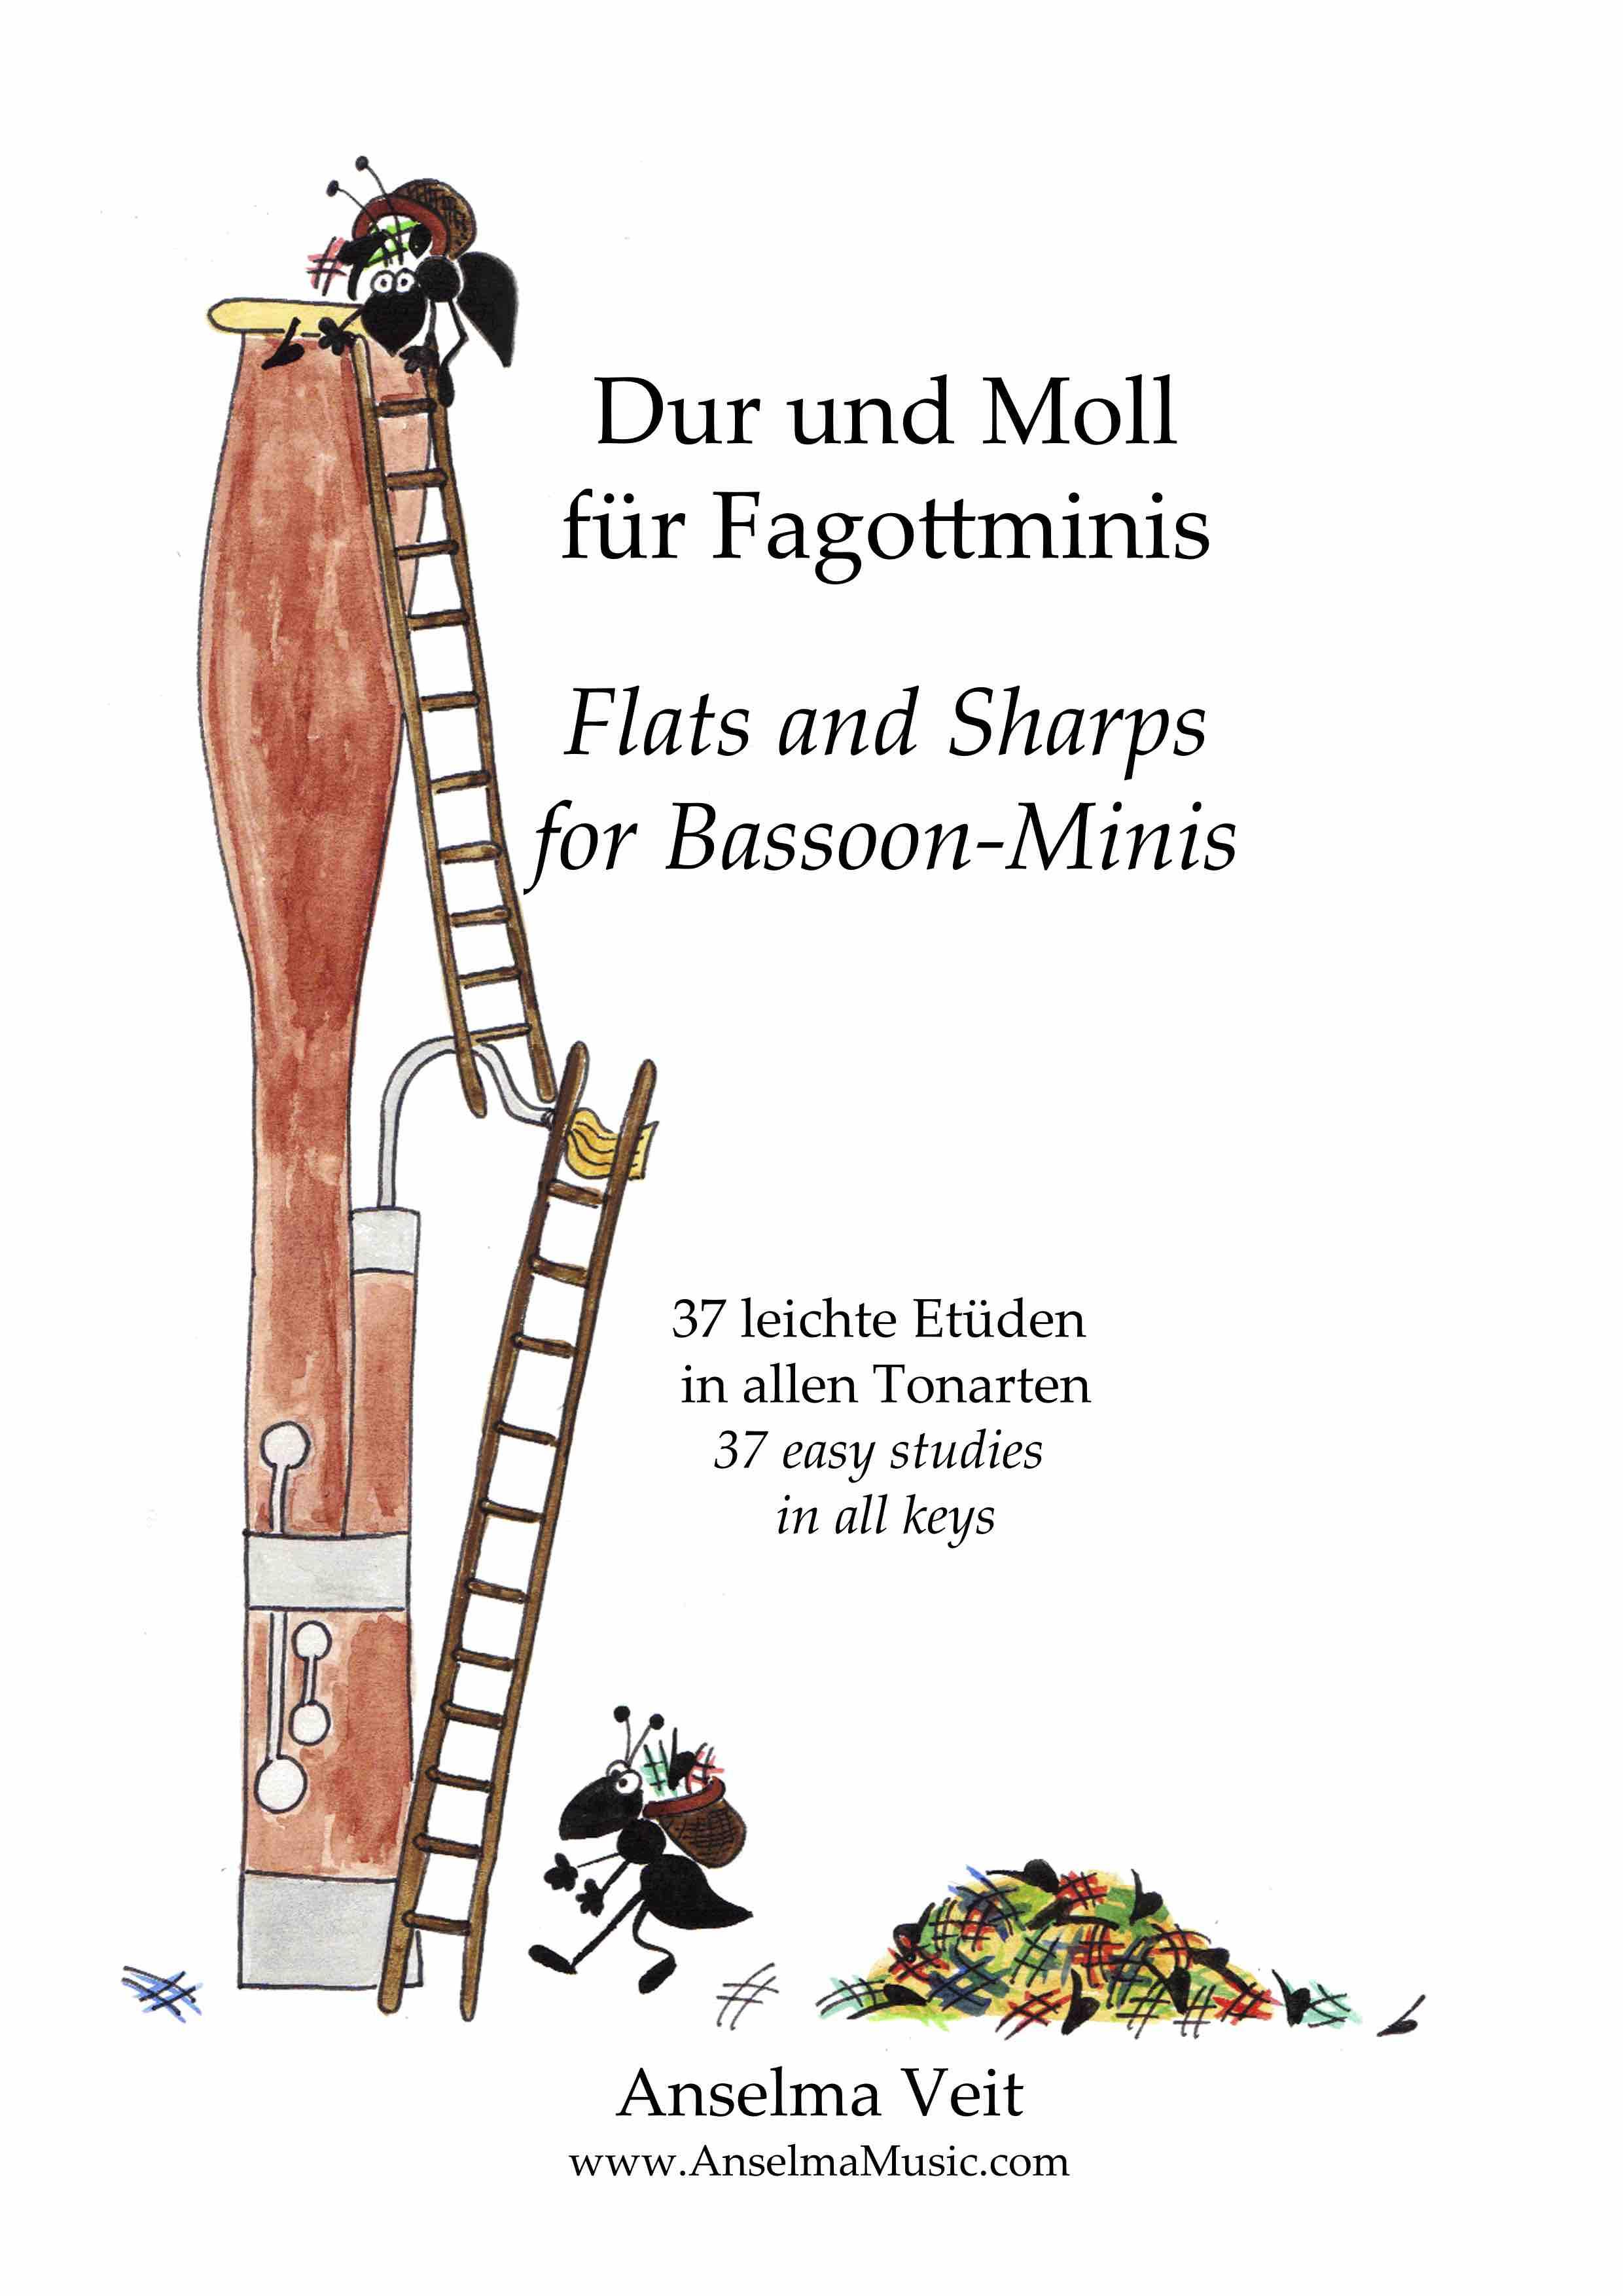 Dur und Molls für Fagottminis Fagott Etüden Anselma Veit